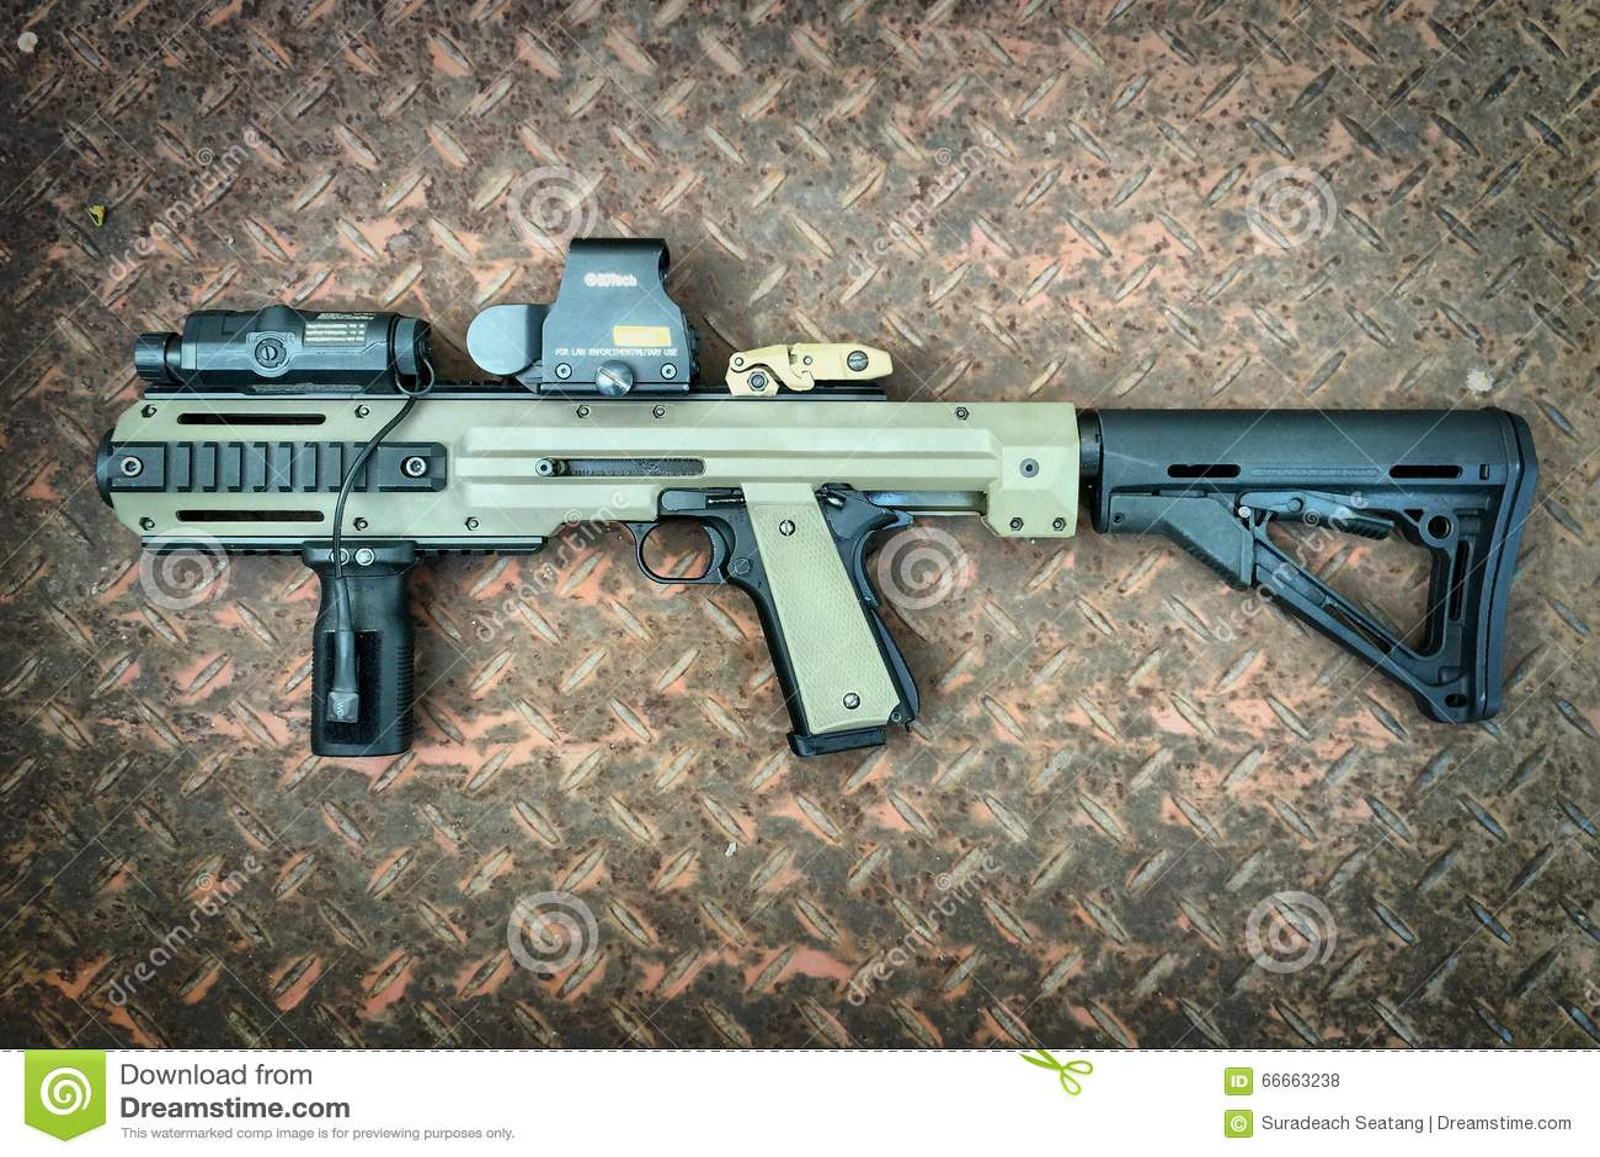 Colt 1911a1 Air Soft Gun With Hera Arms Conversion Kit